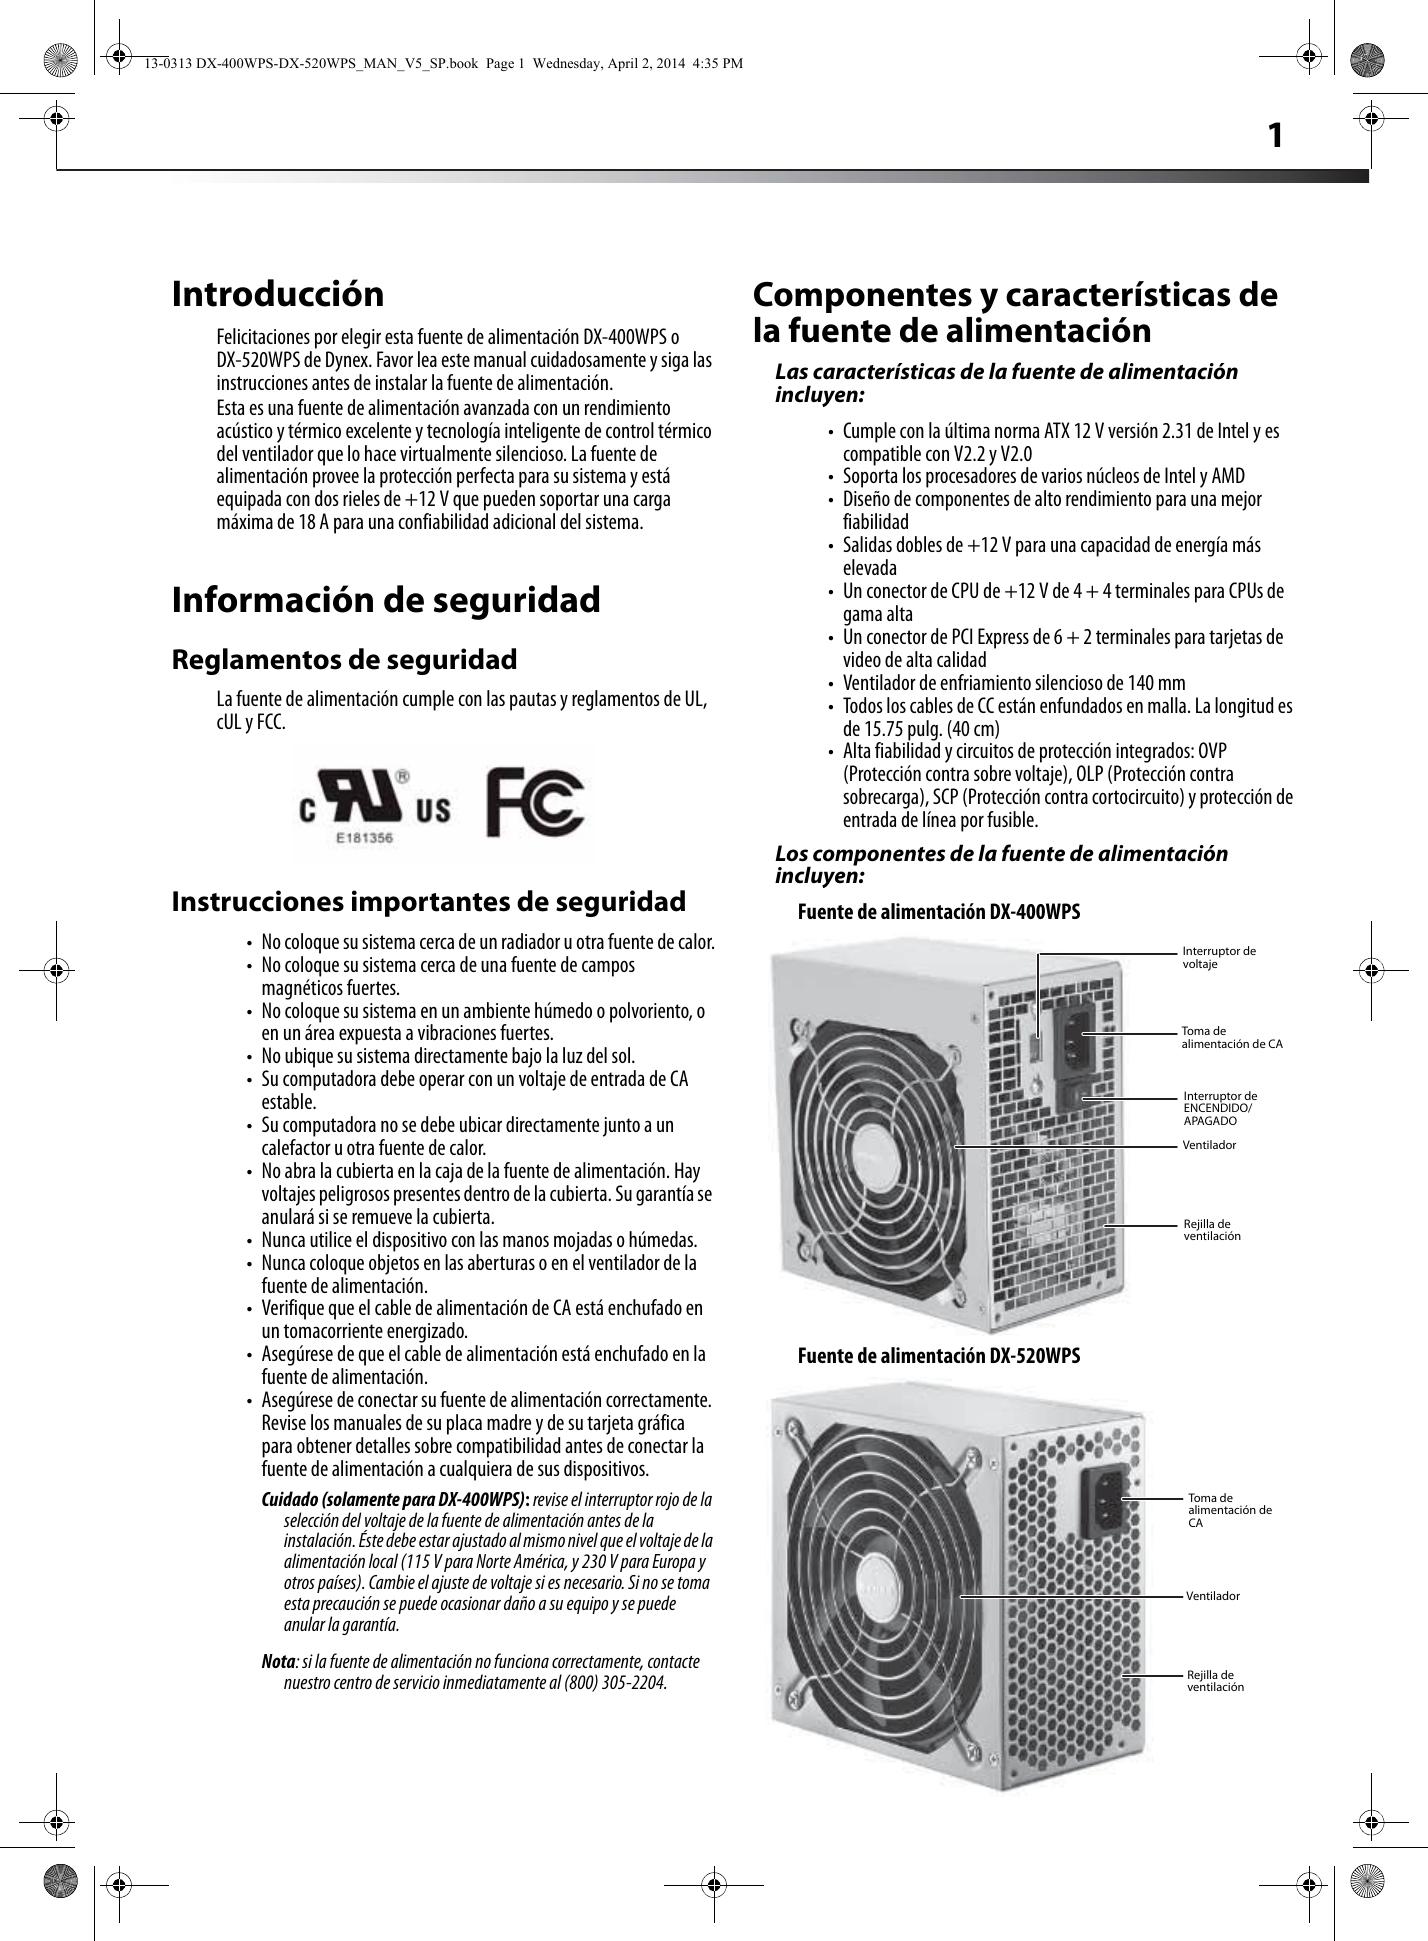 dynex 400 watt atx cpu power supply white users manual 13 0313 dx rh usermanual wiki Clip Art User Guide Kindle Fire User Guide